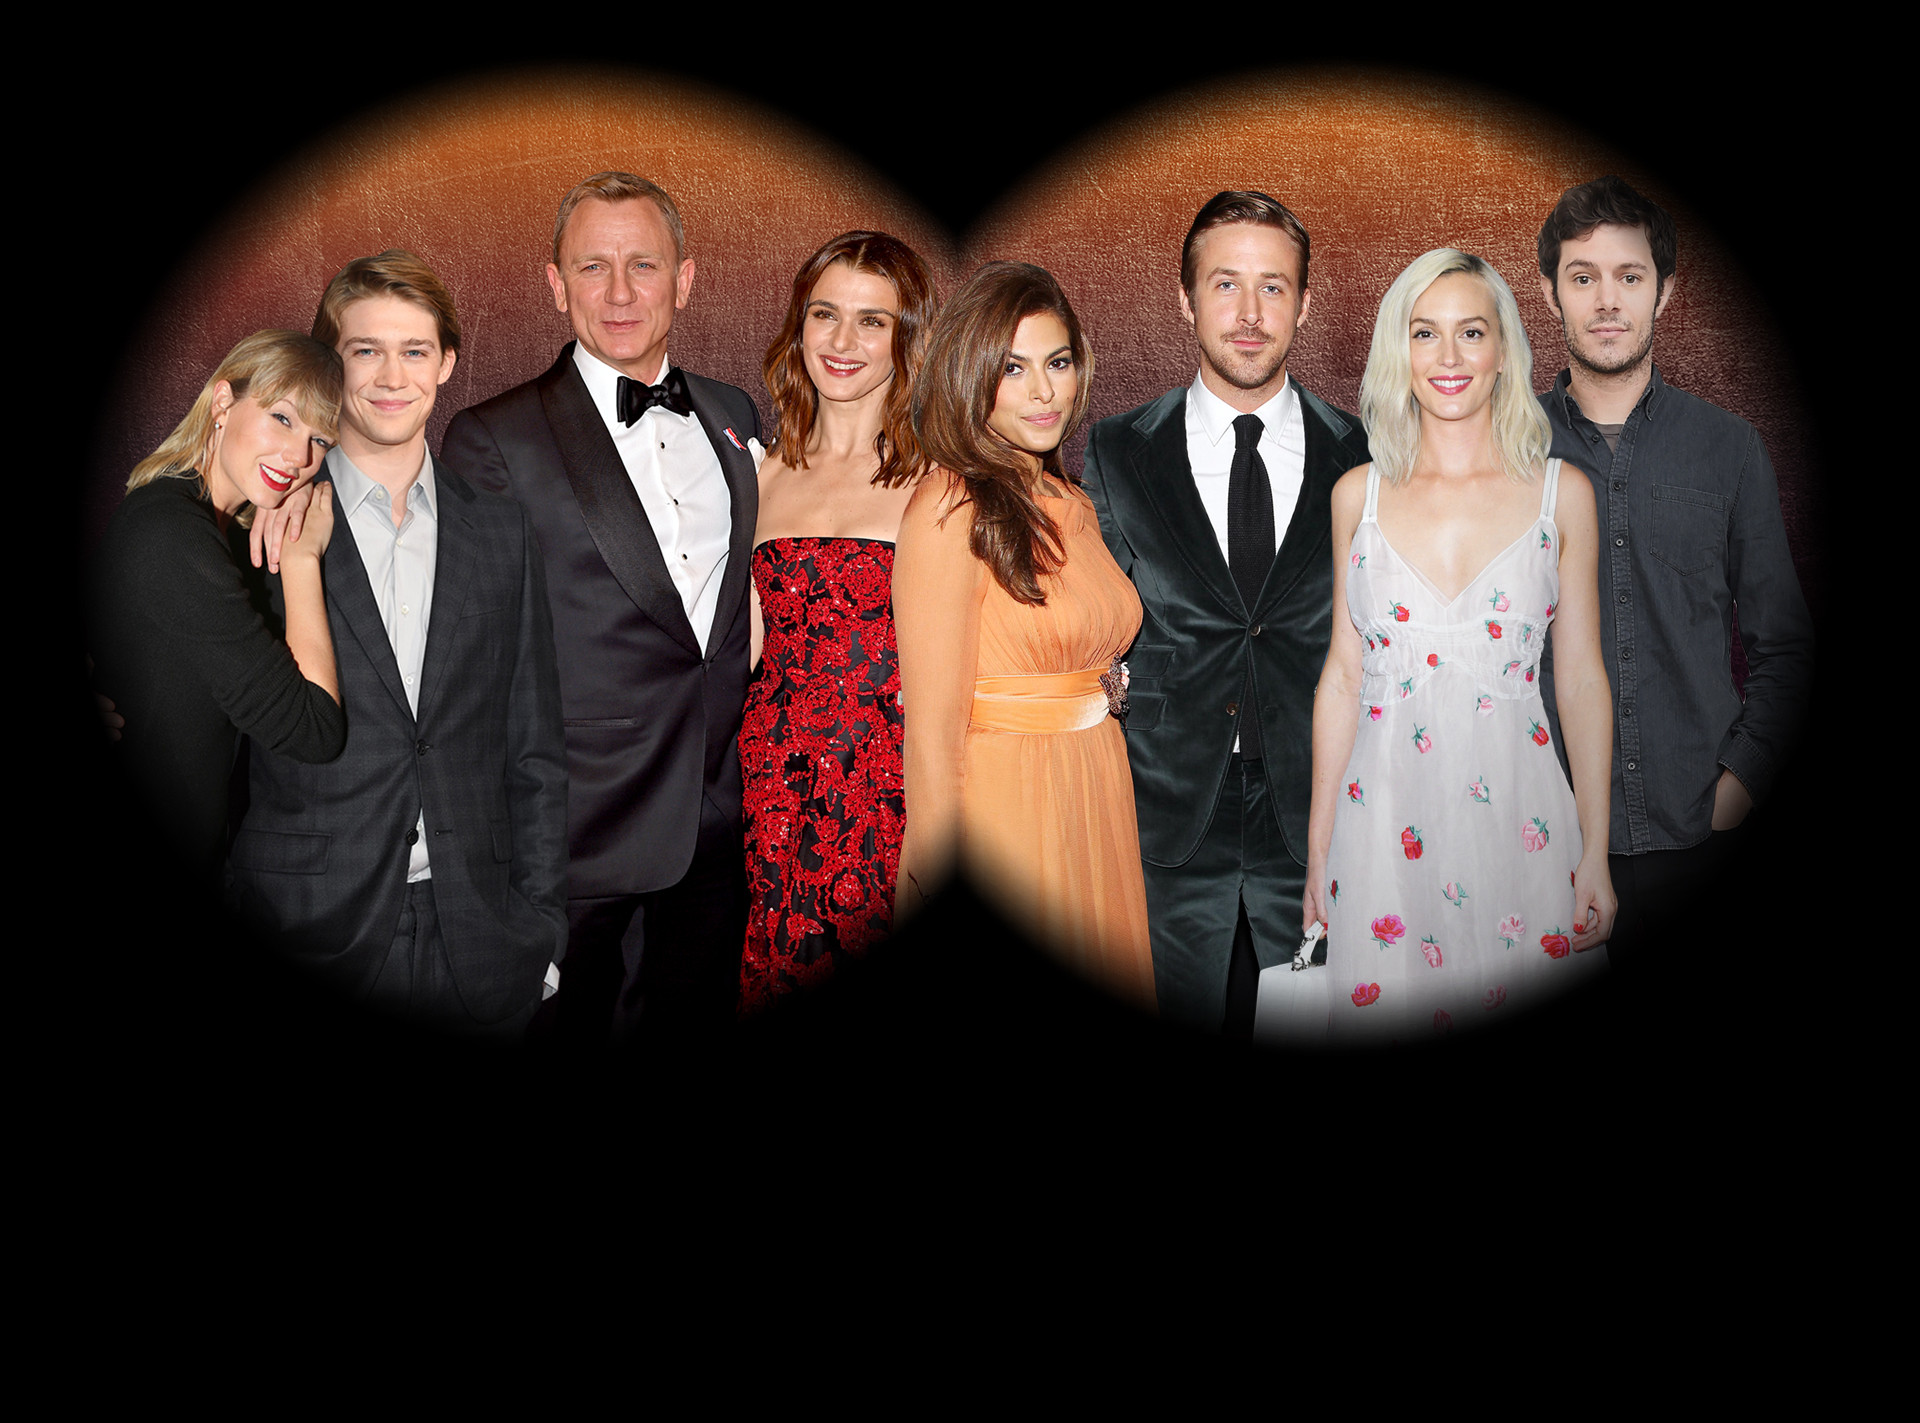 Under the Radar Couples, Eva Mendes, Ryan Gosling, Rachel Weisz, Daniel Craig, Leighton Meester, Adam Brody, Taylor Swift, Joe Alwyn